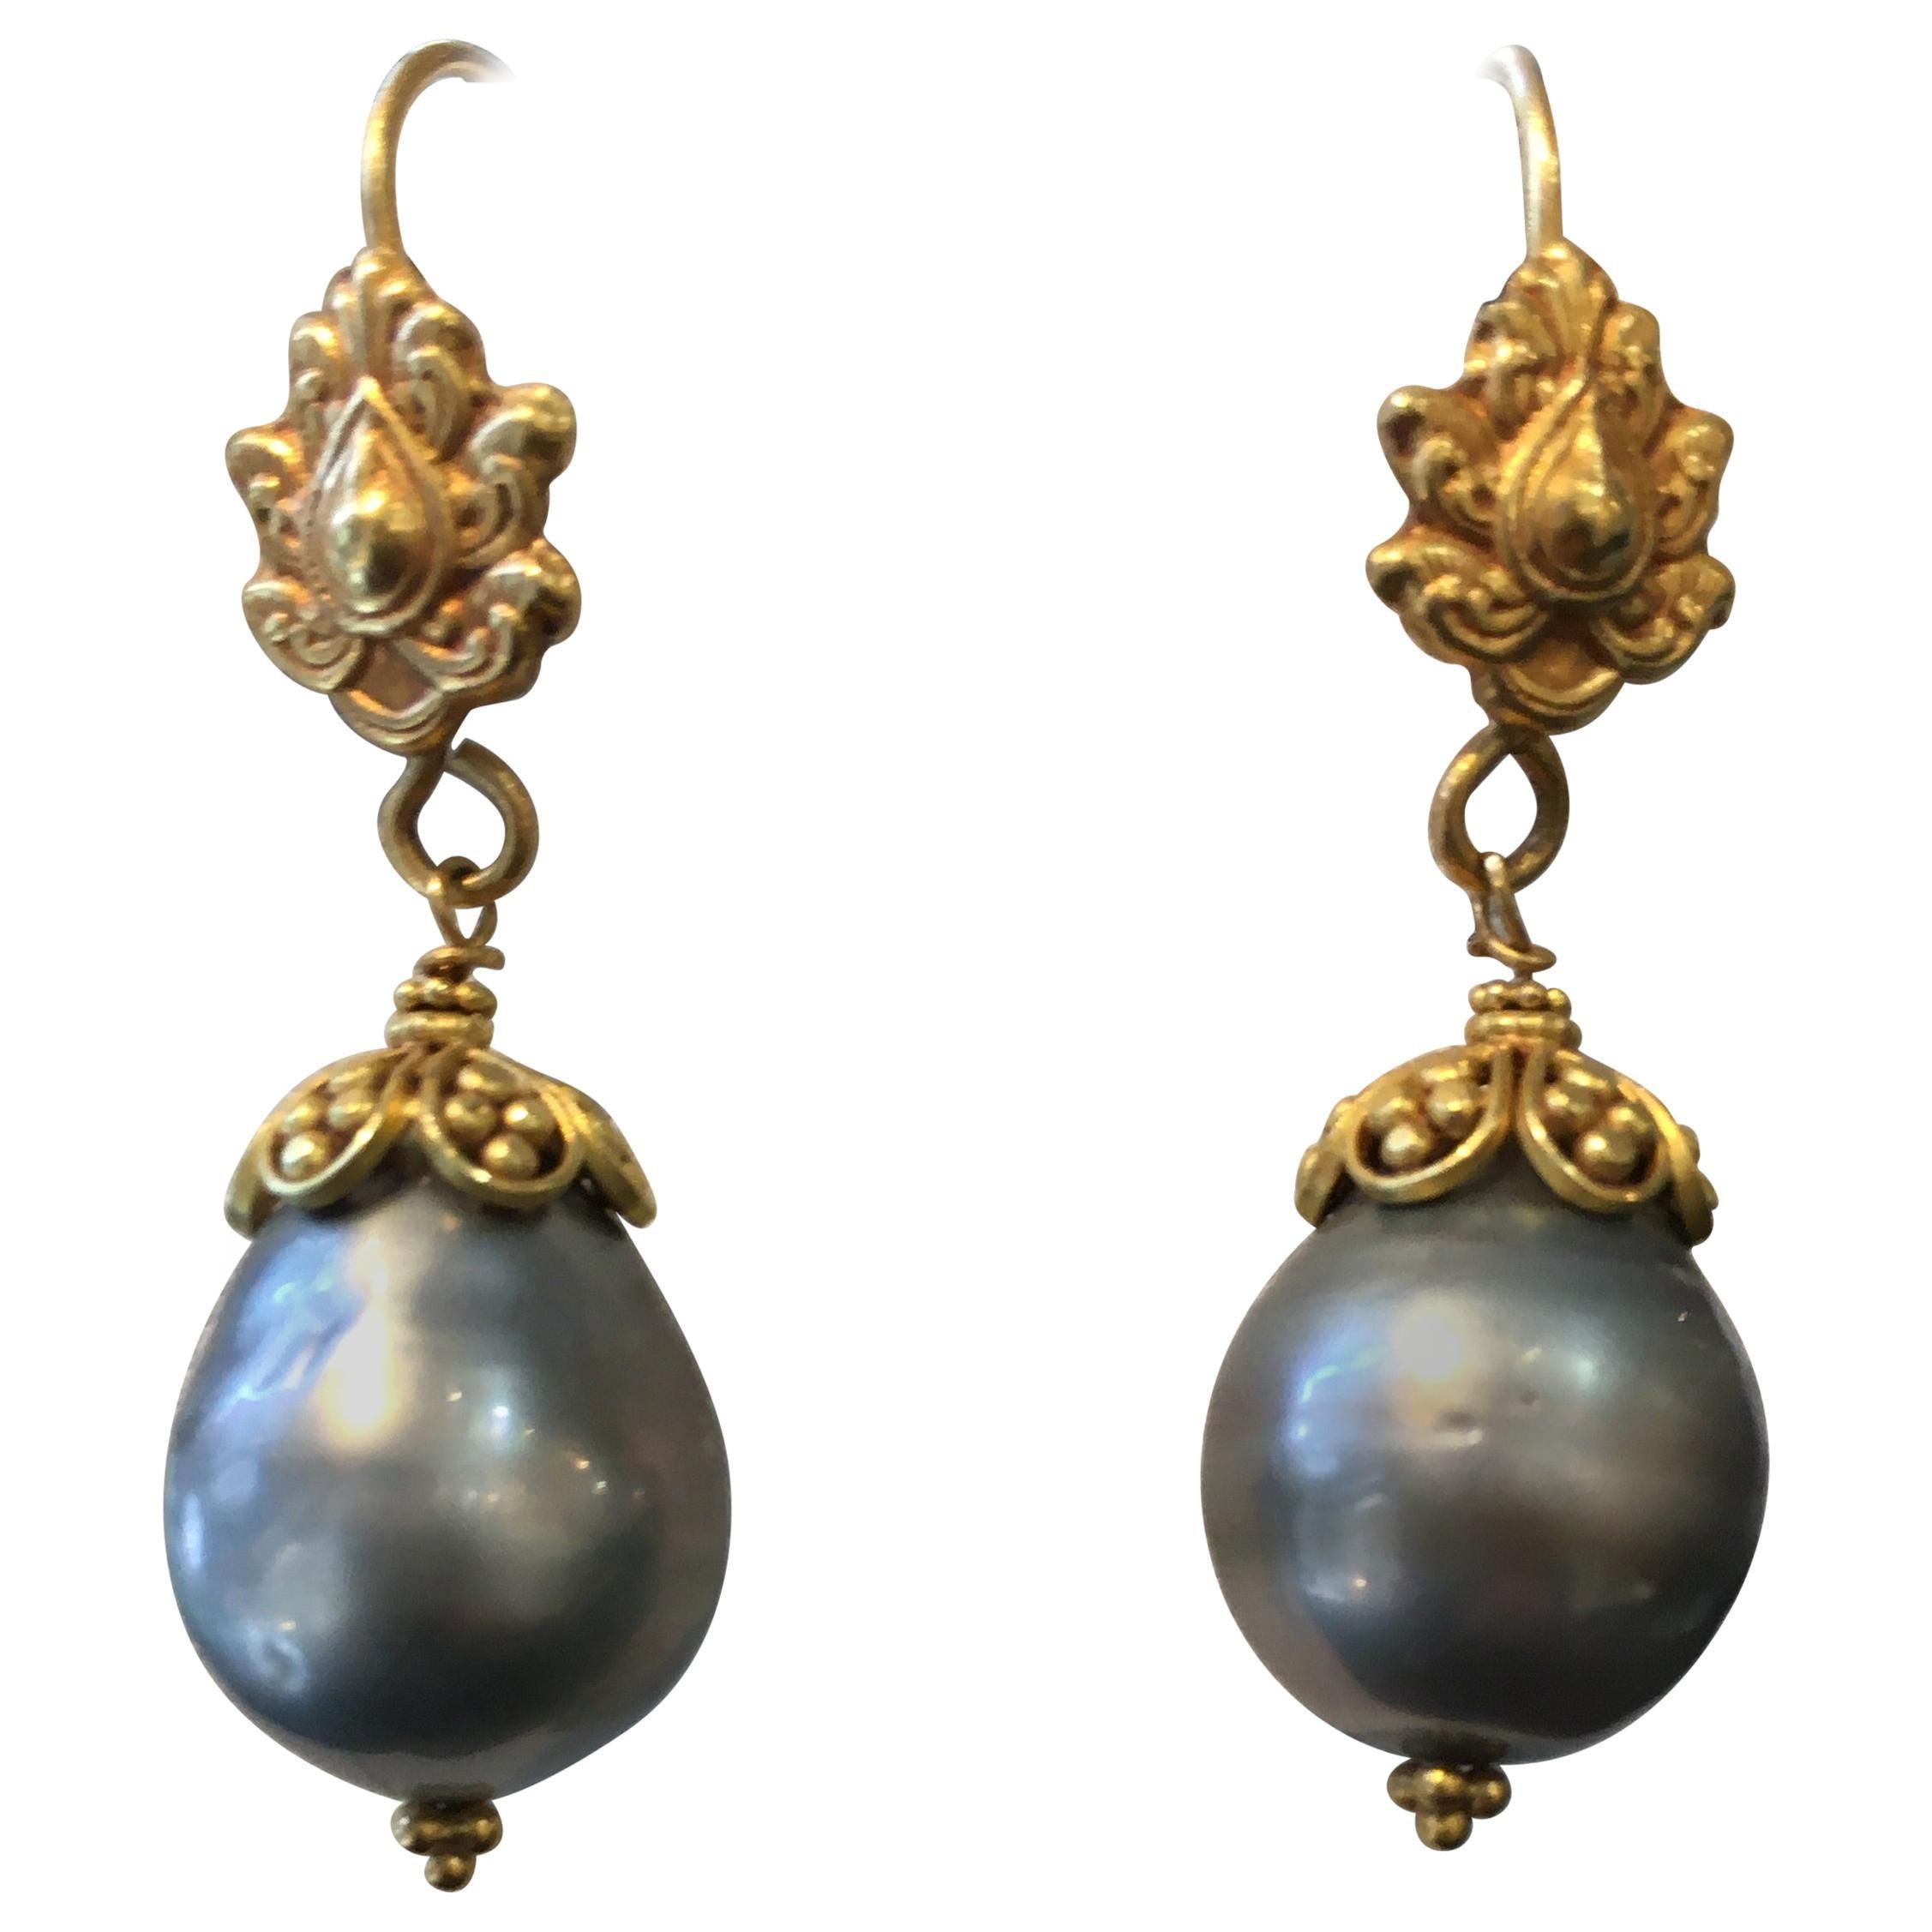 Tahitian Pearl and 22 Karat Gold Drop Earrings by Deborah Lockhart Phillips